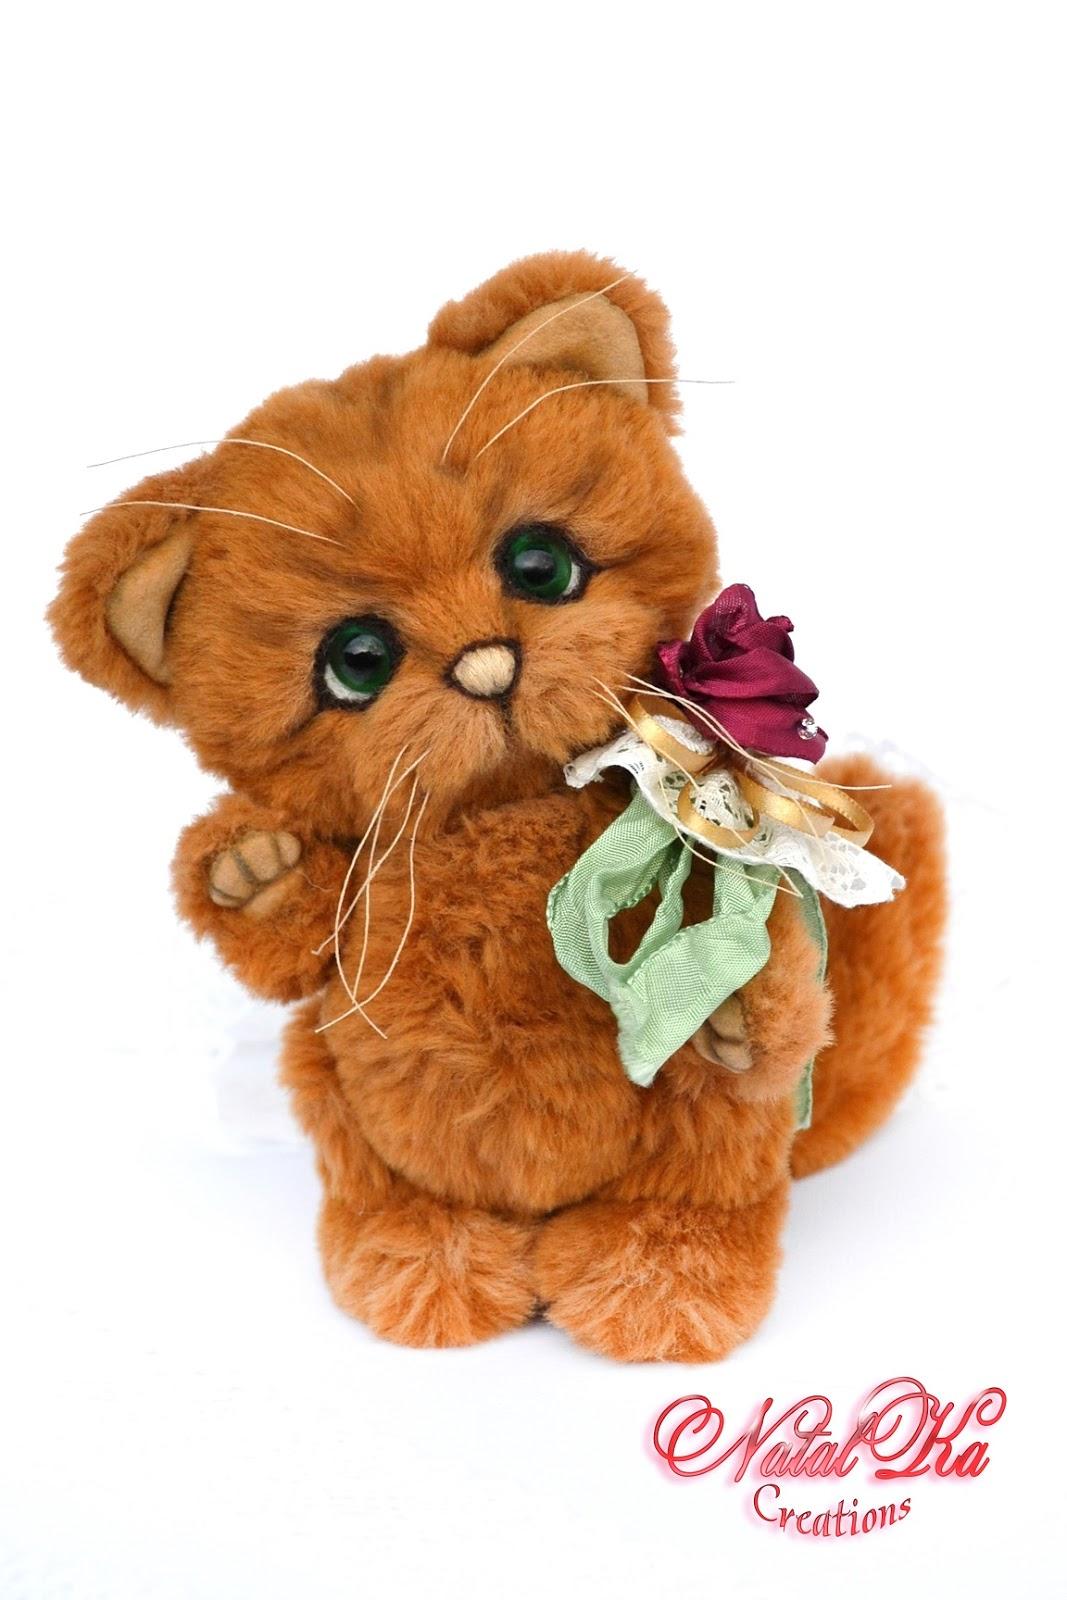 Artist teddy cat, artist teddy, teddies, ooak, handmade by NatalKa Creations. Авторский кот тедди, котенок, кошка, ручная работа в единственном экземпляре от NatalKa Creations